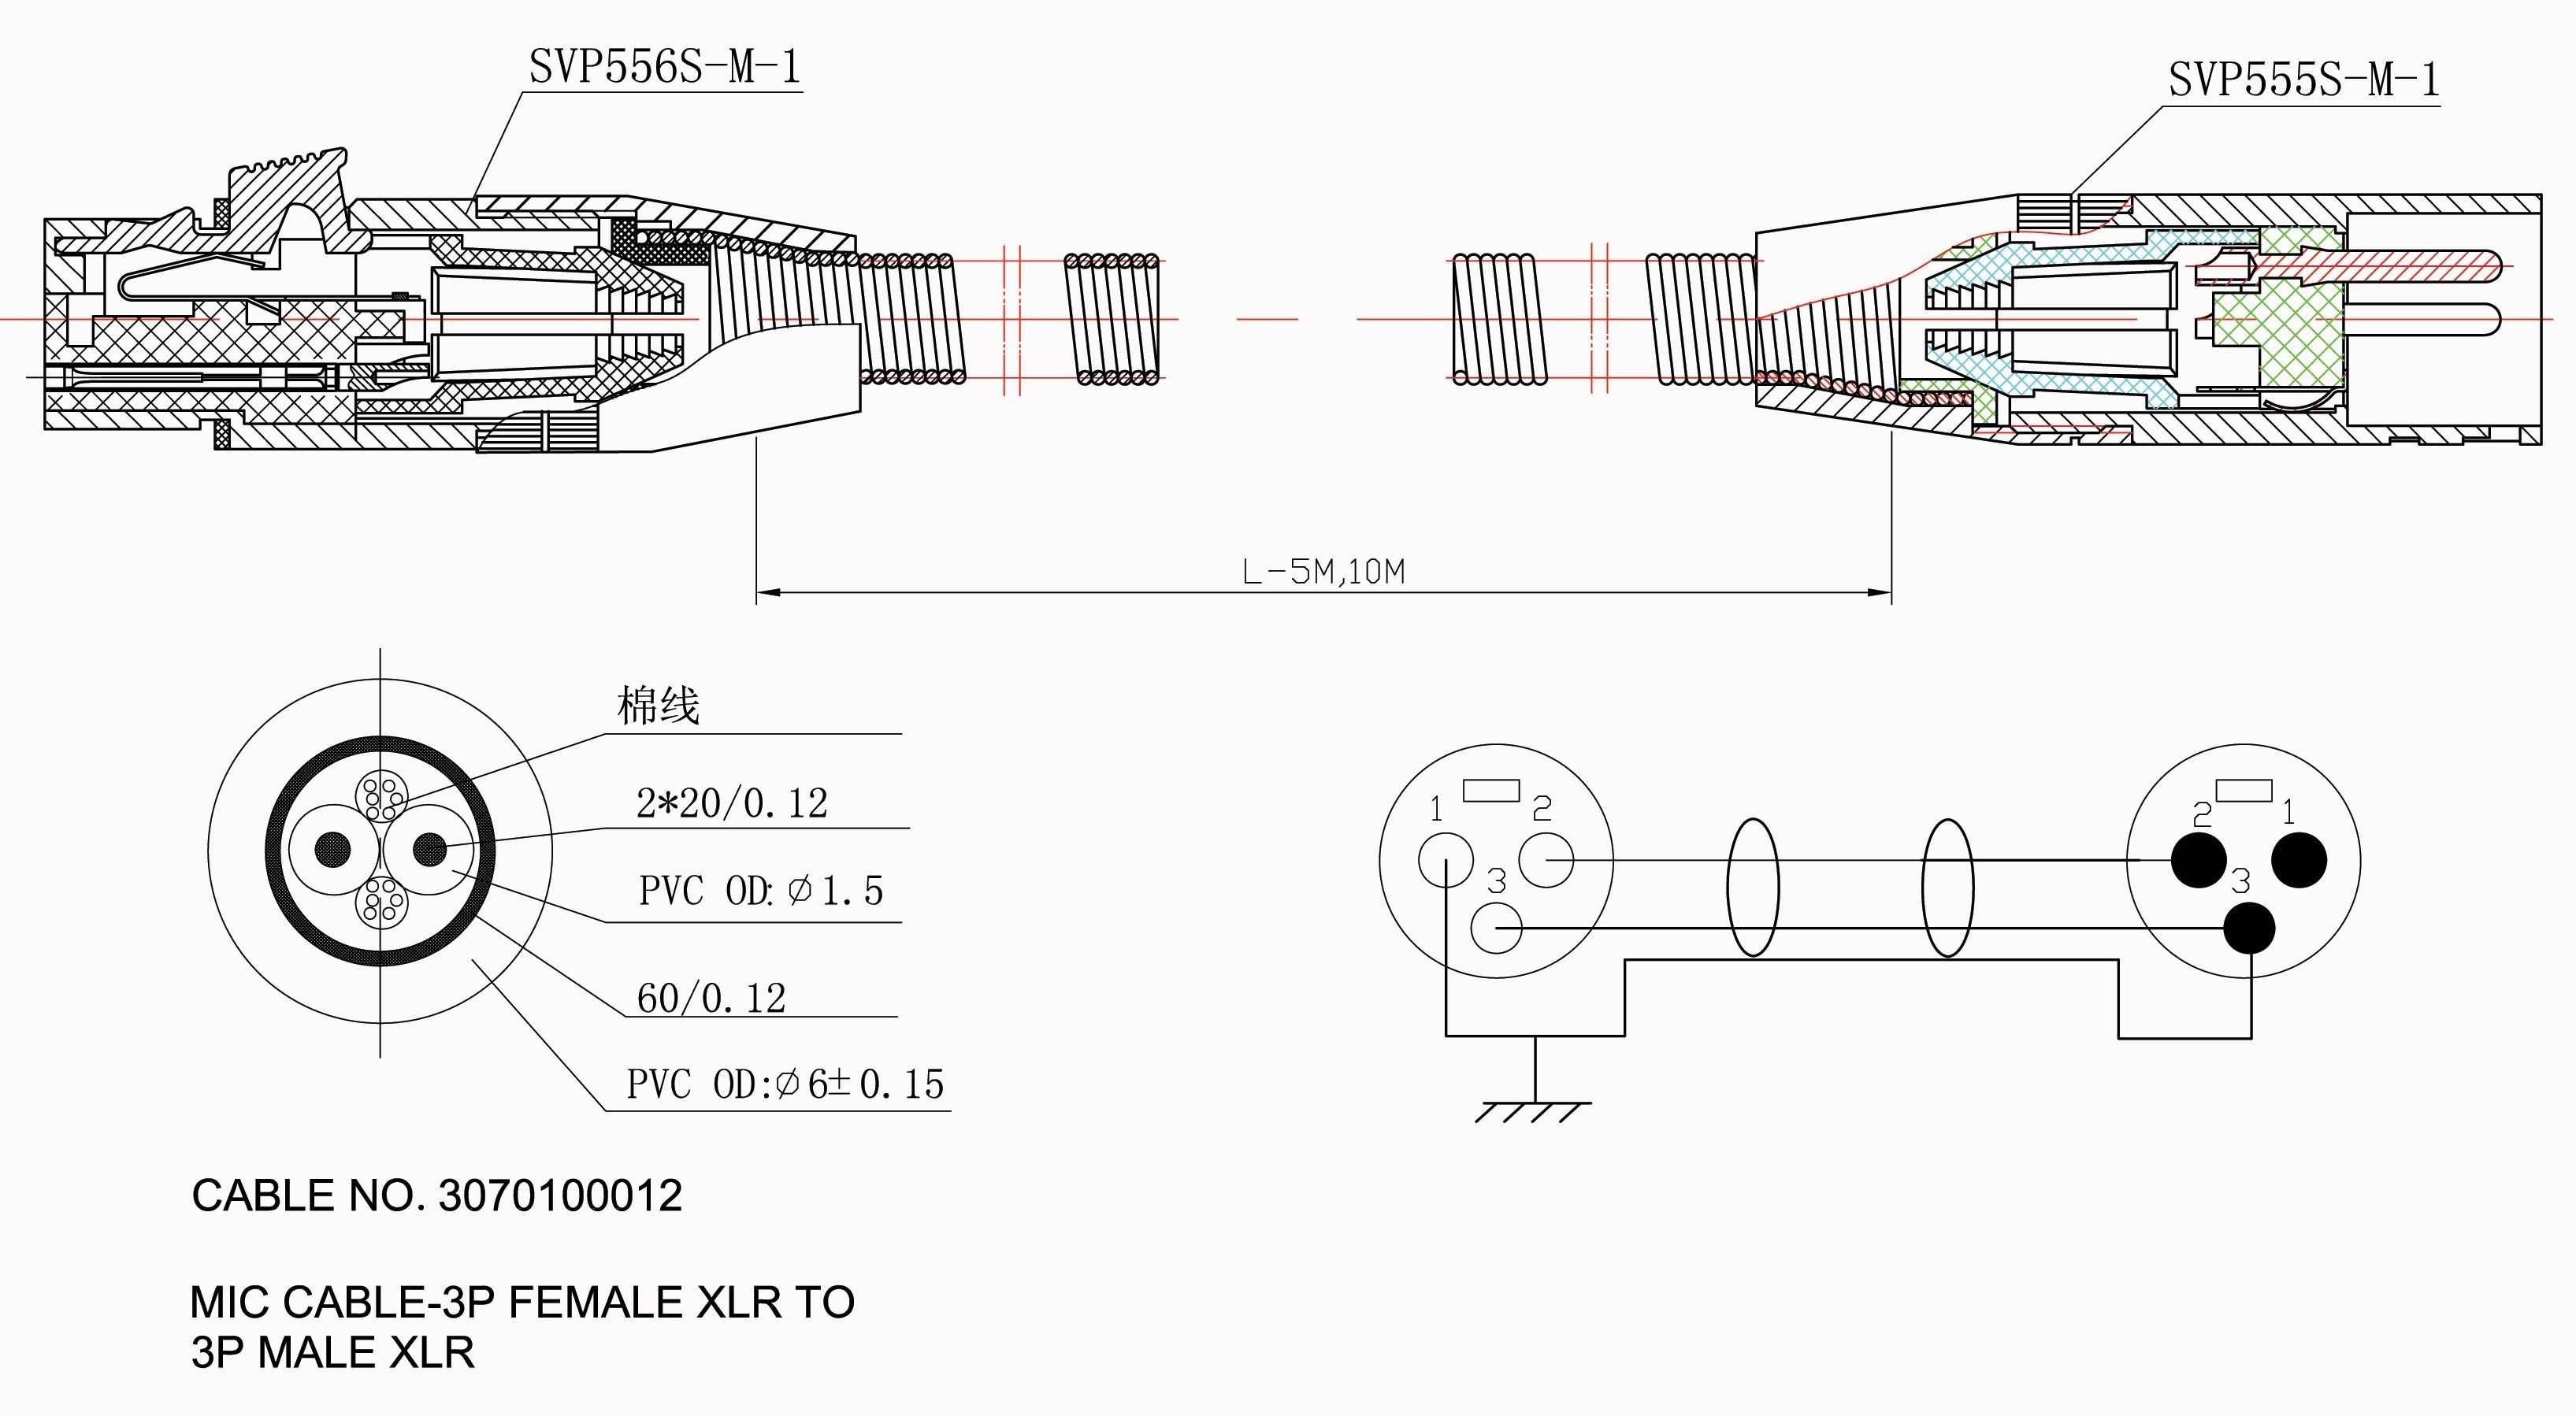 Solar Light Wiring Diagram Sure Trac Dump Trailer Wiring Diagram Valid 12v Lighting Circuit Of Solar Light Wiring Diagram